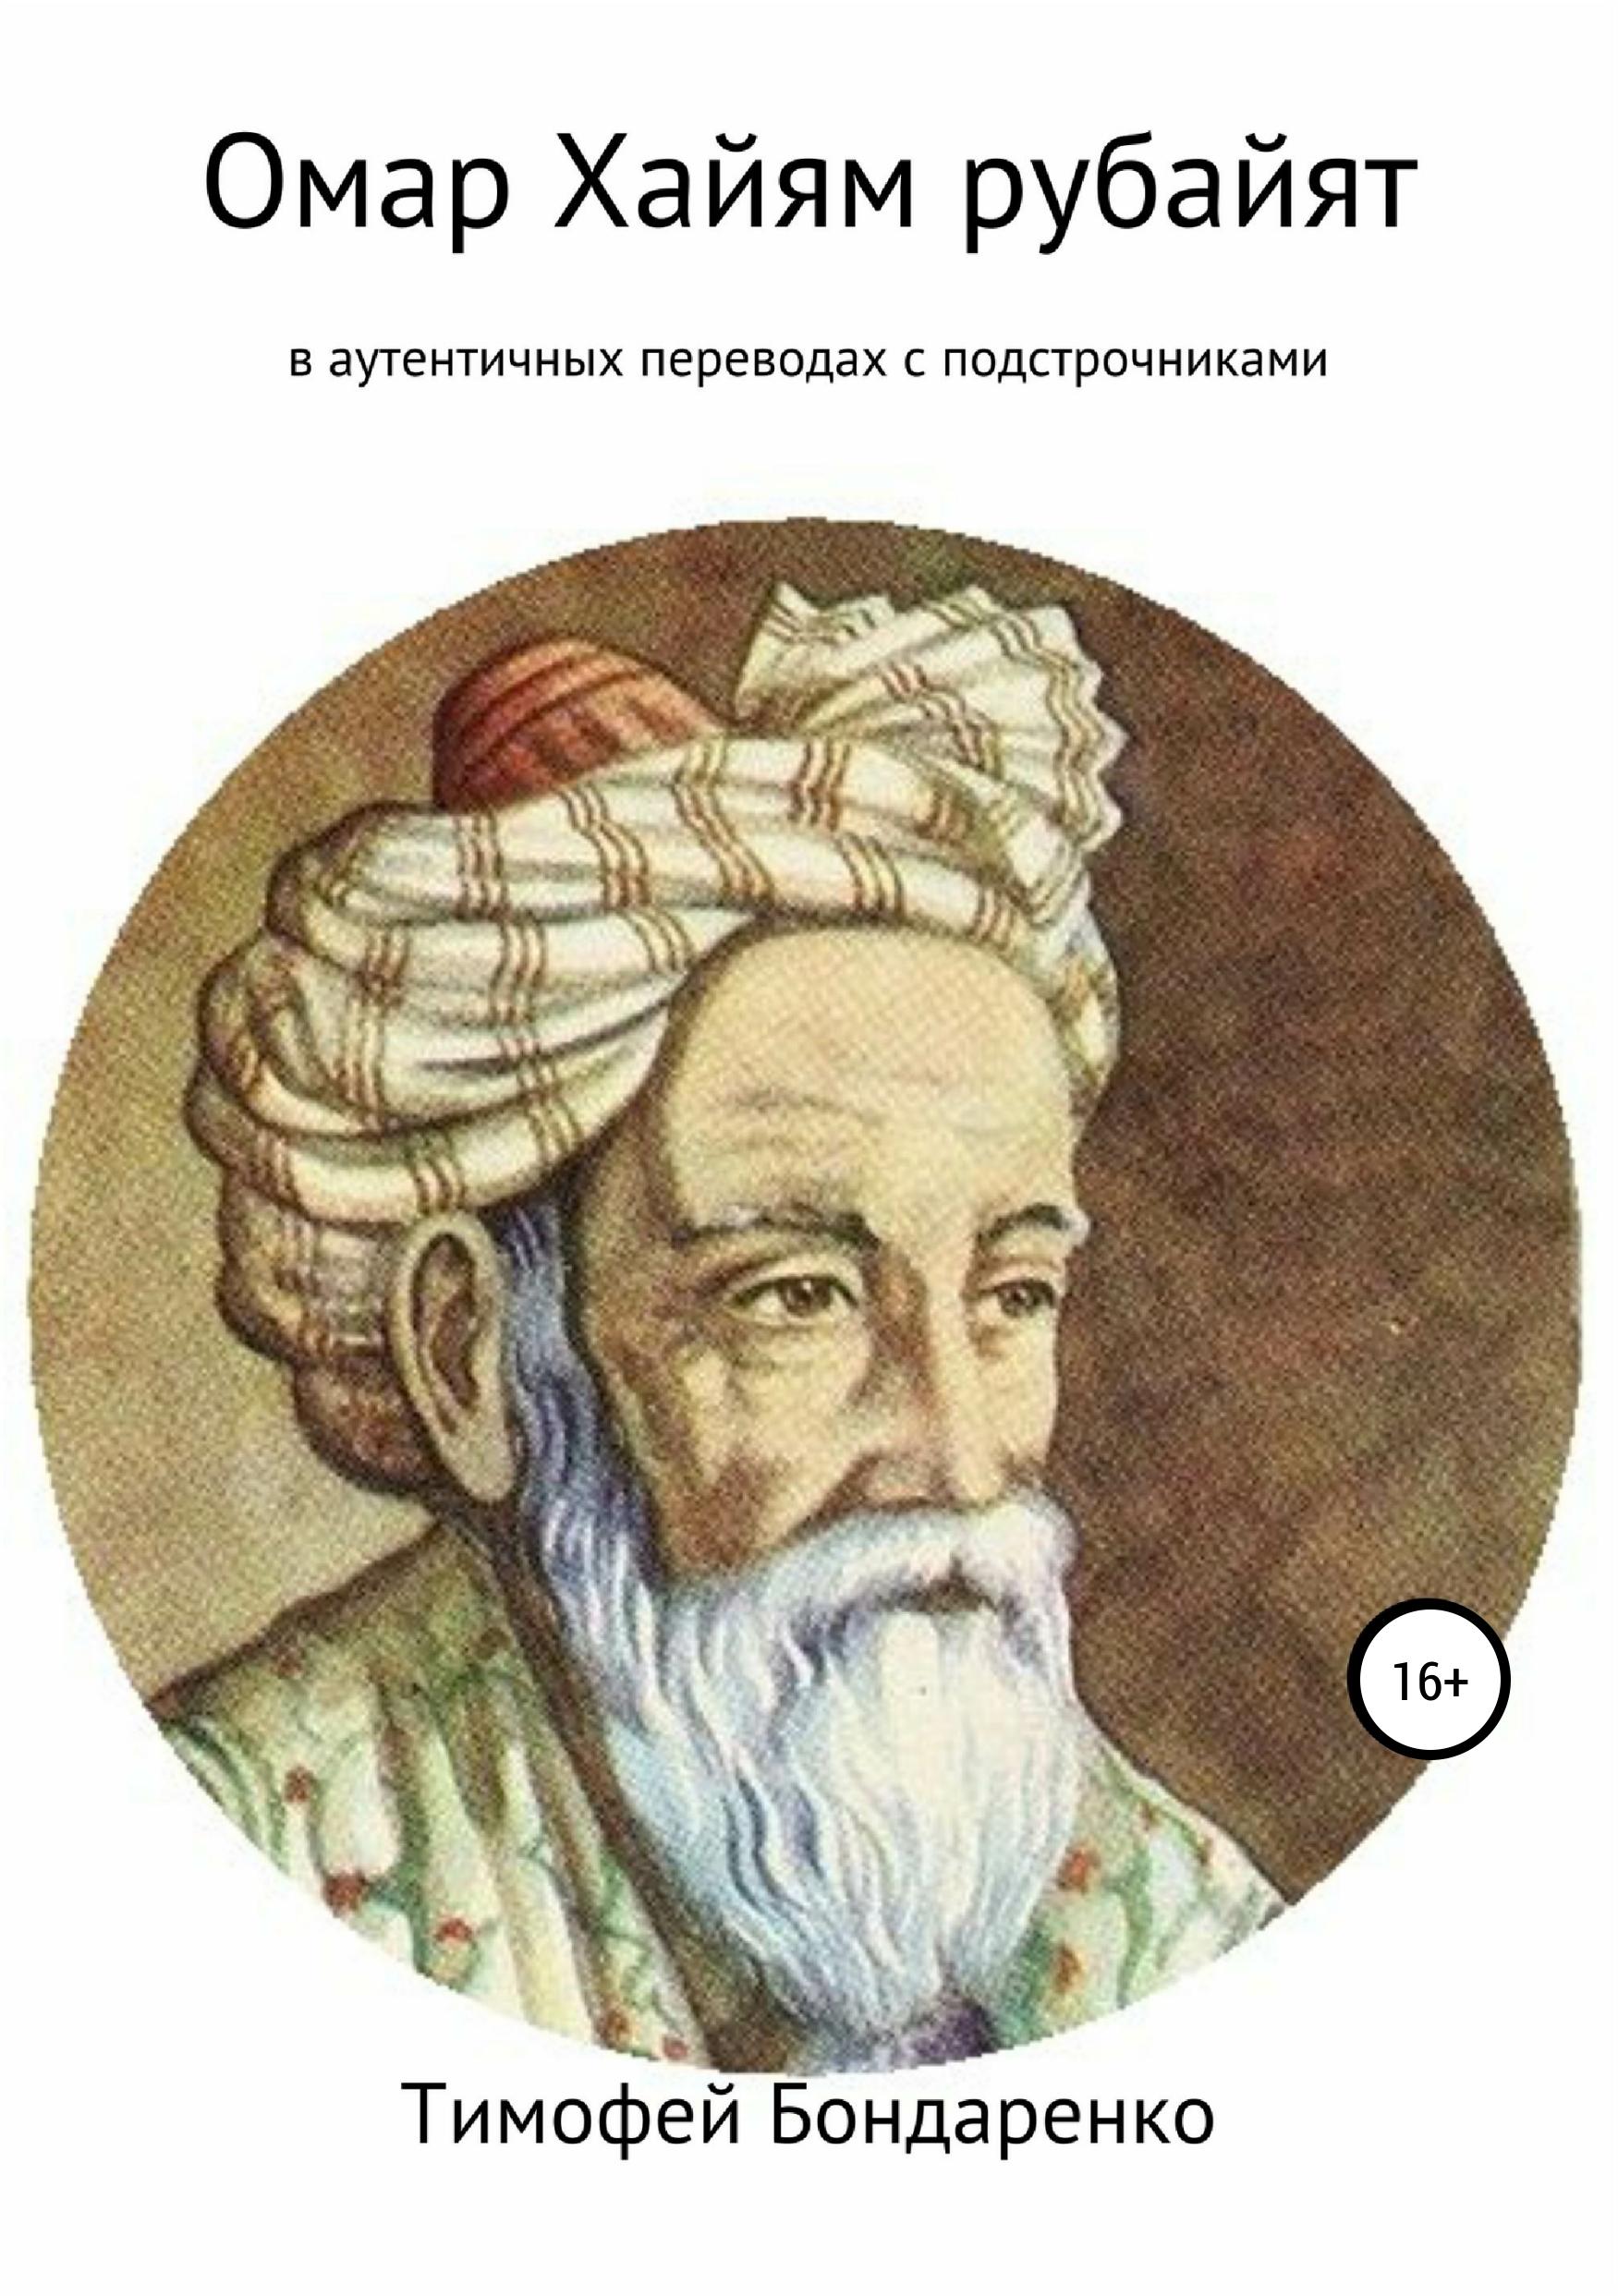 Омар Хайям Омар Хайям рубайят (в аутентичных переводах с подстрочниками) хайям о рубайят о любви